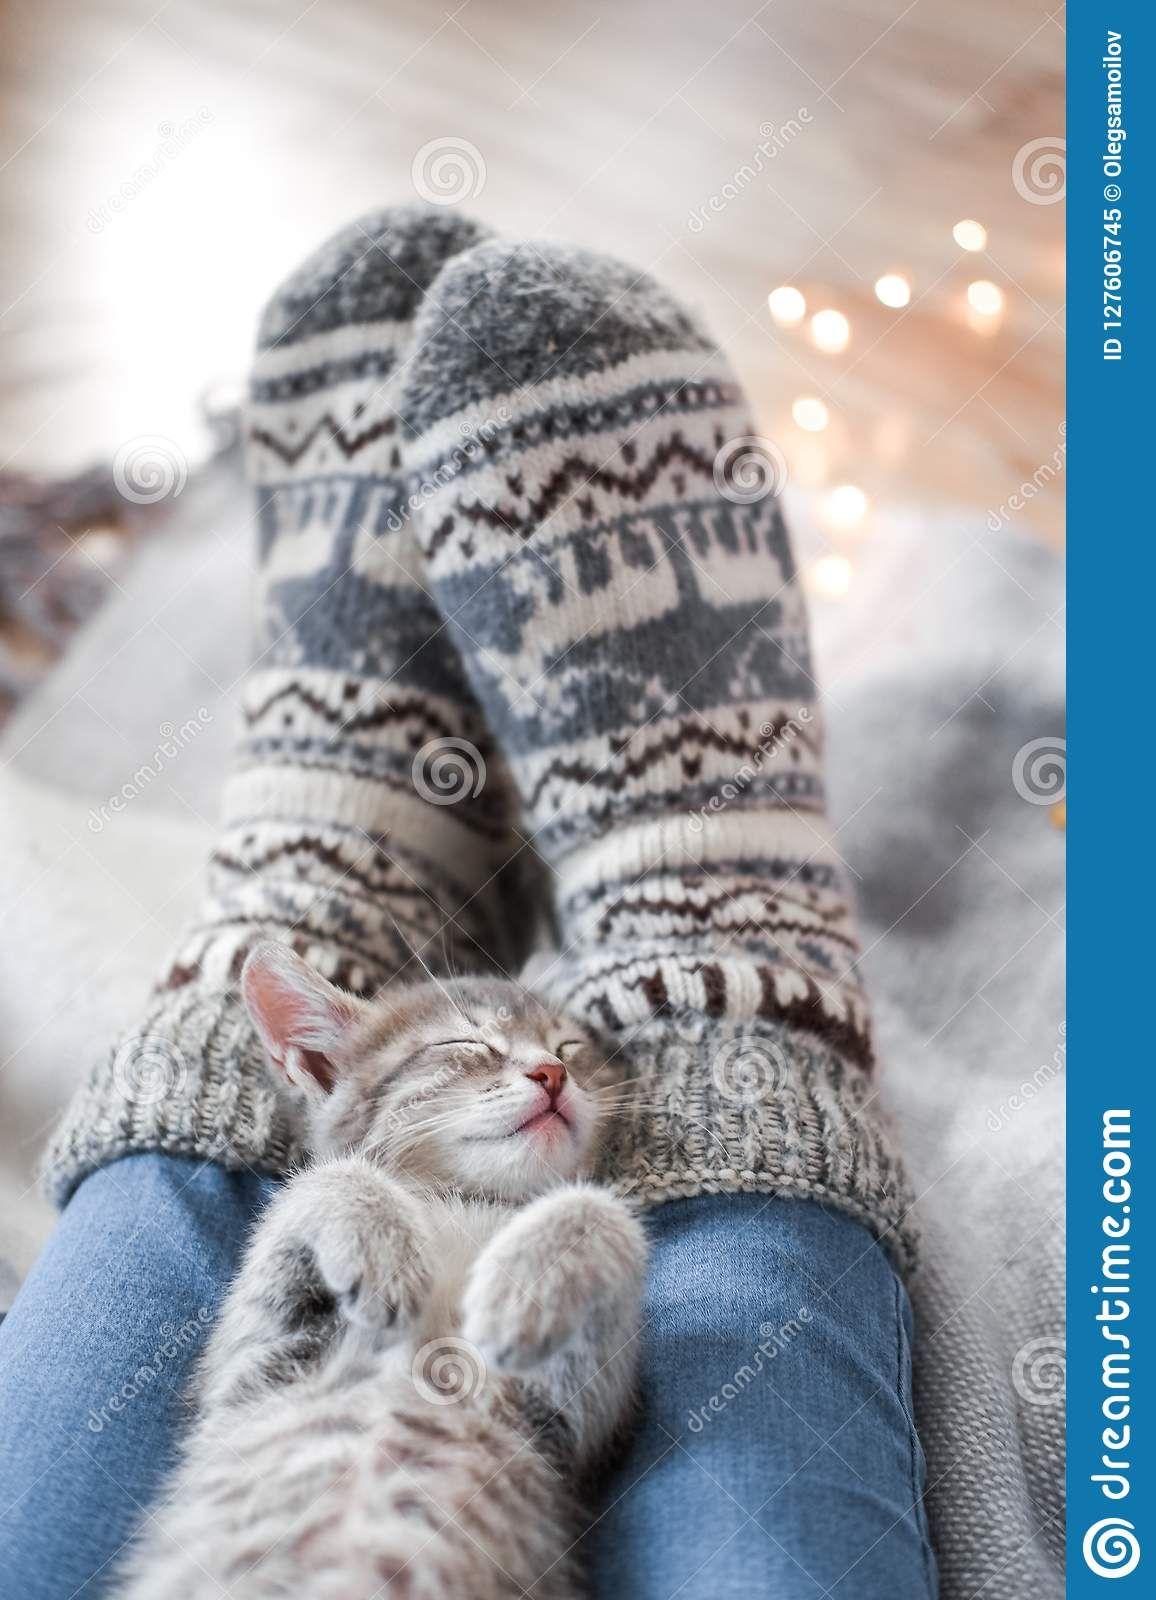 Cute Gray Kitten Resting Christmas Lights On The Background Grey Kitten Kittens Cutest Grey Tabby Kittens